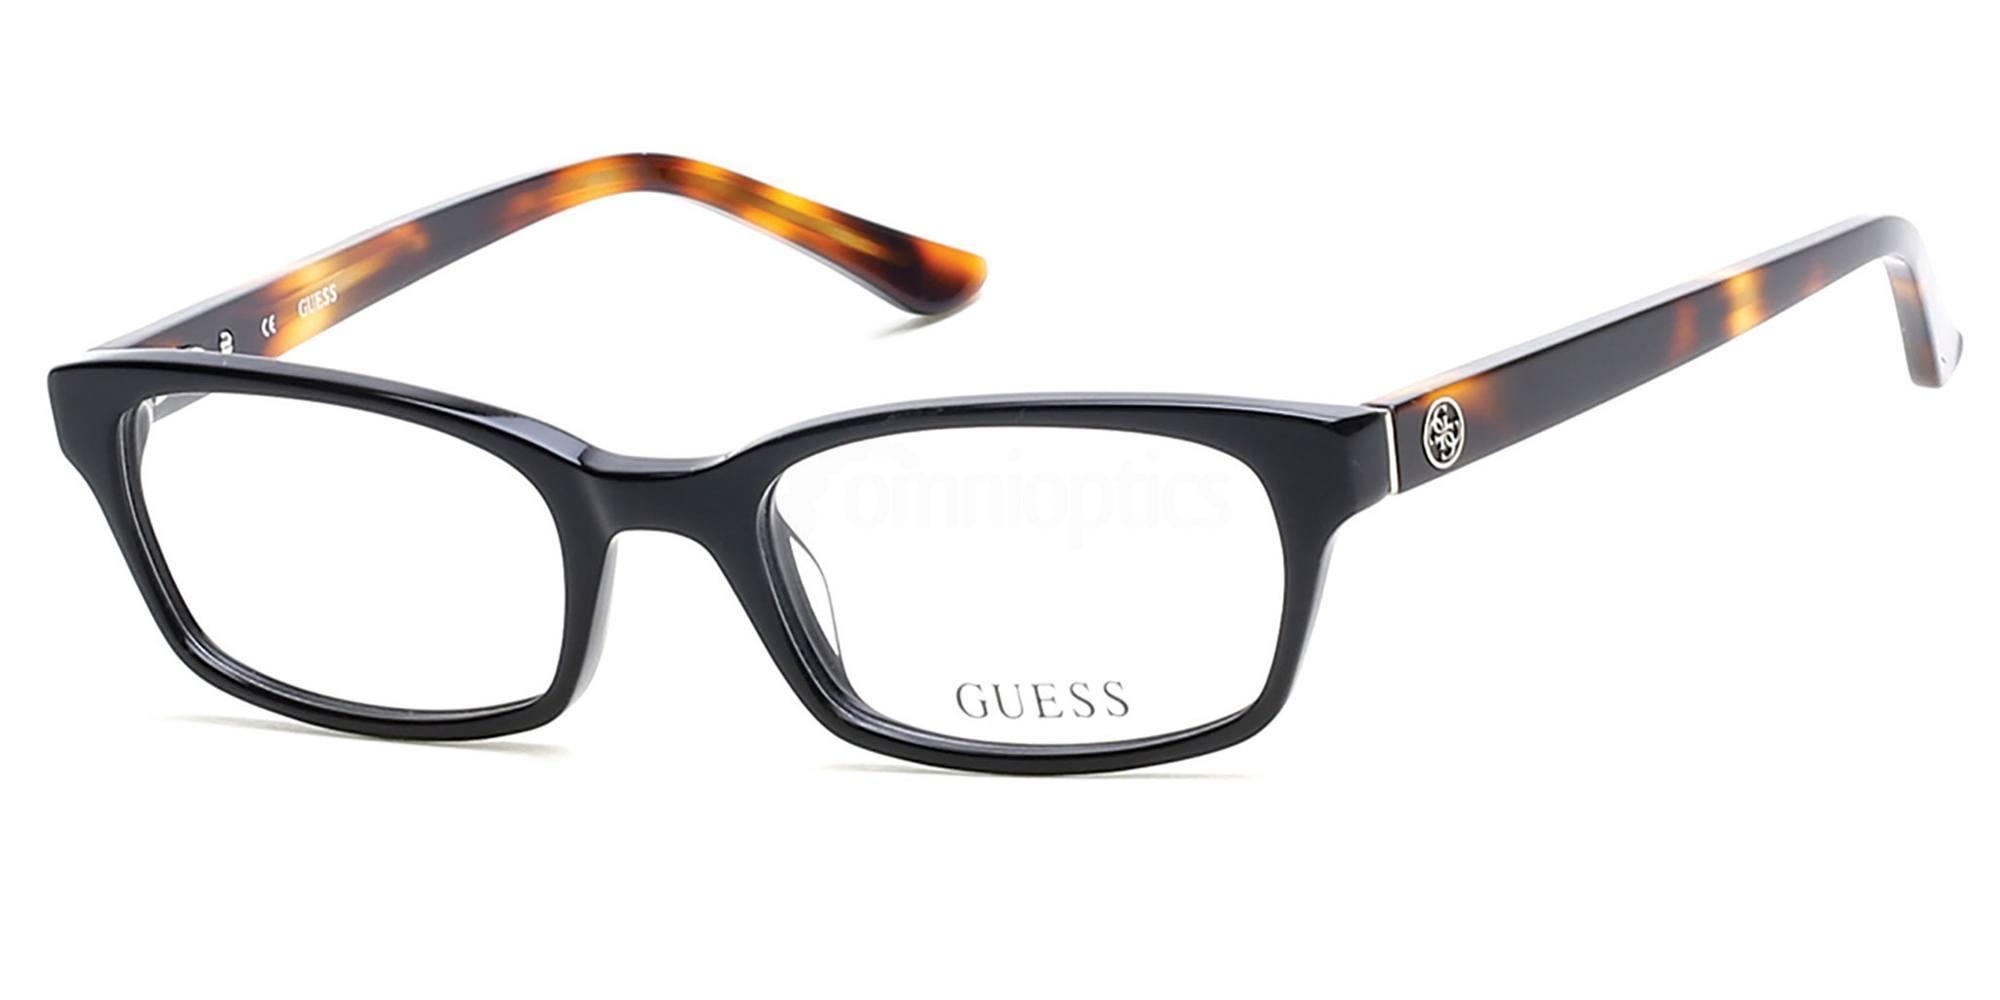 001 GU2535 , Guess